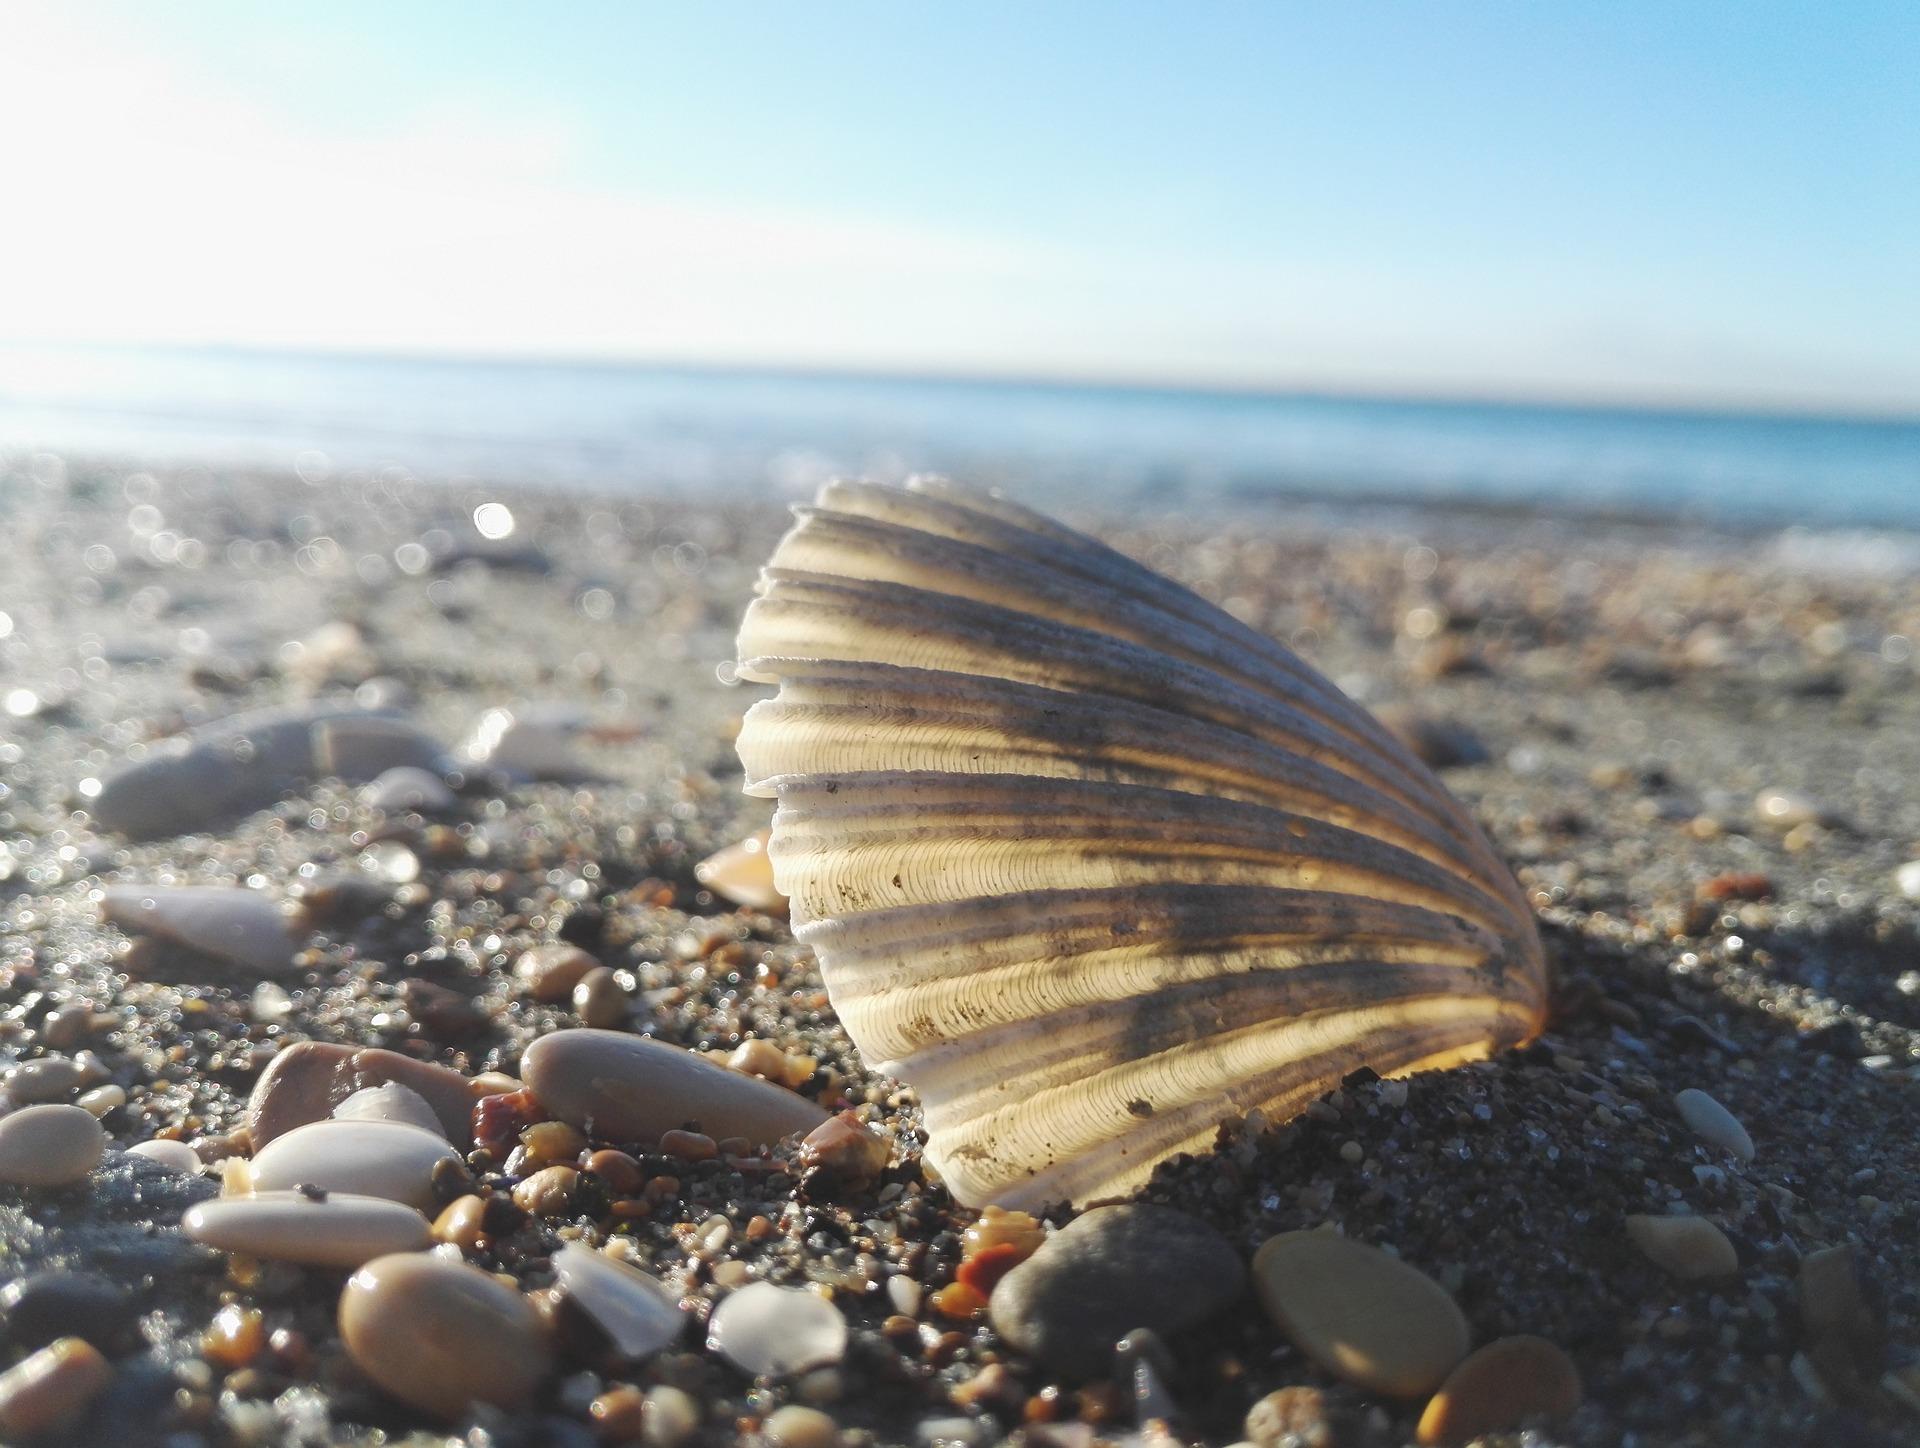 shell-2956899_1920